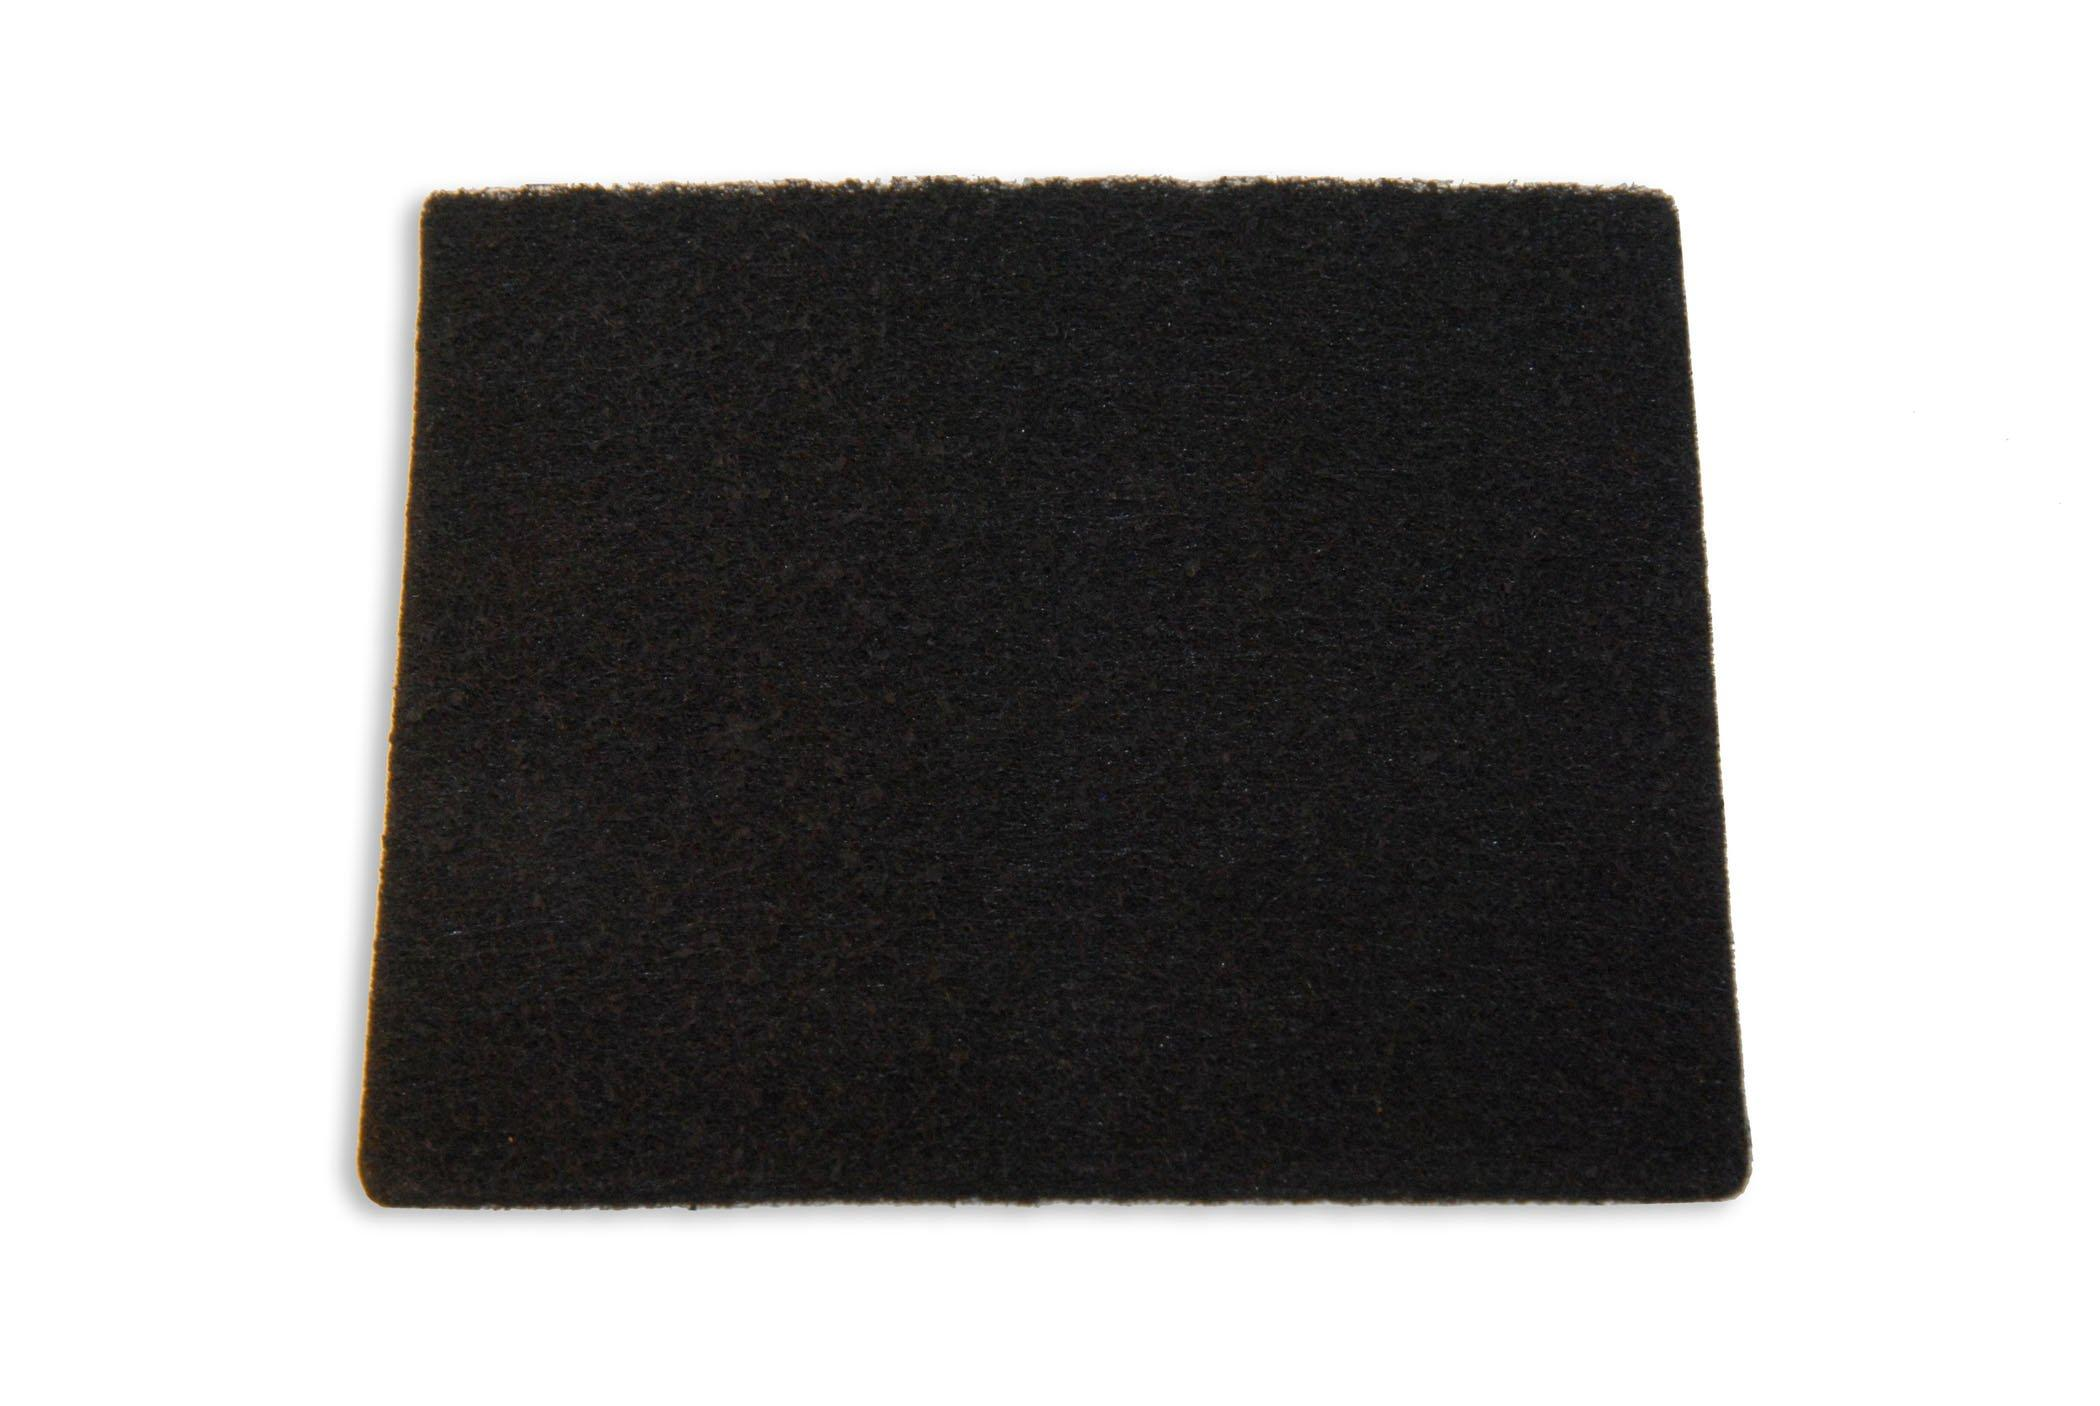 Carbon Filter for Select Hoover Bagless Uprights